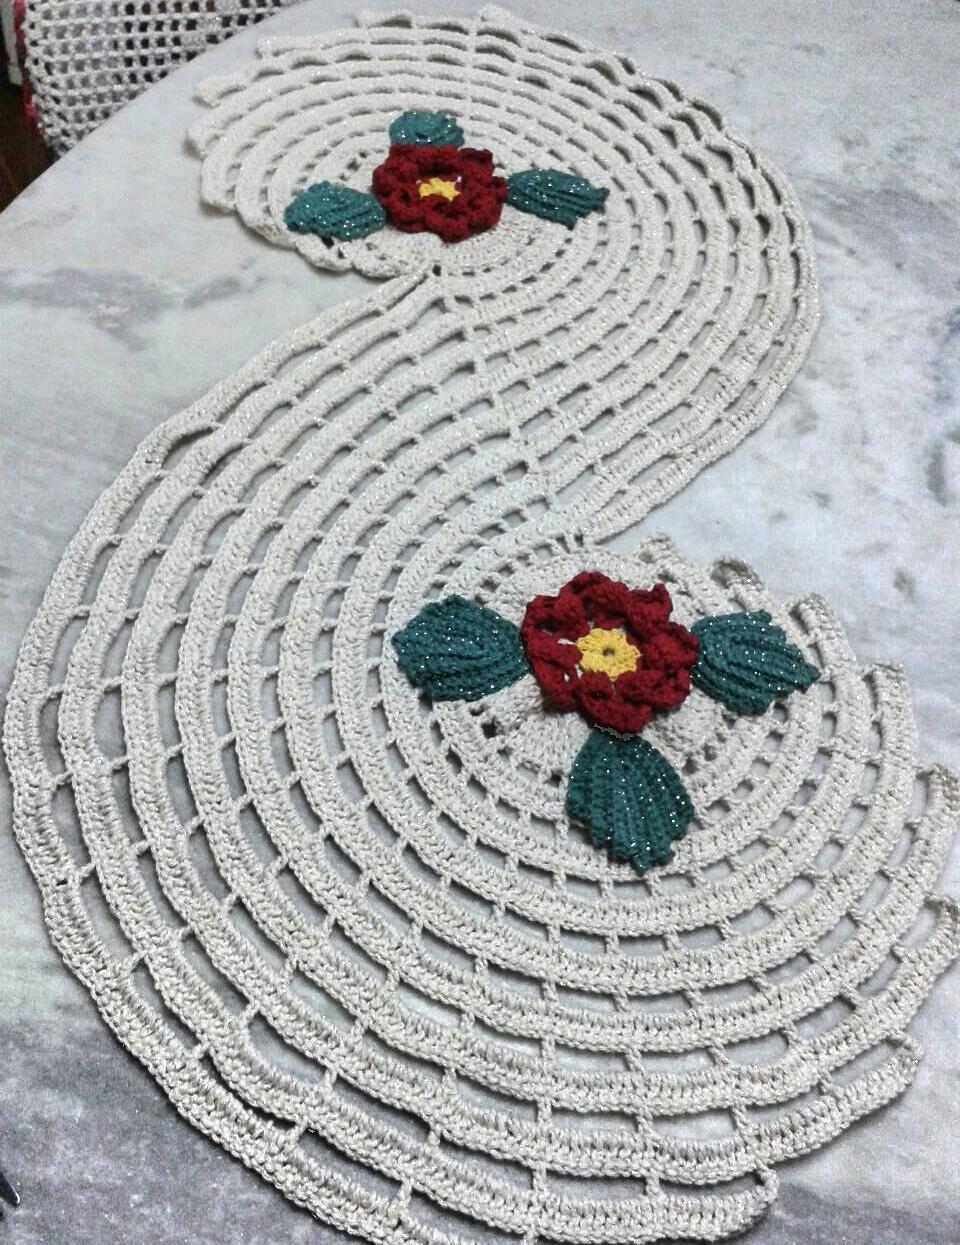 Caminos De Mesa En Crochet. Camino Para Mesa Crochet. Caminos Mesa ...